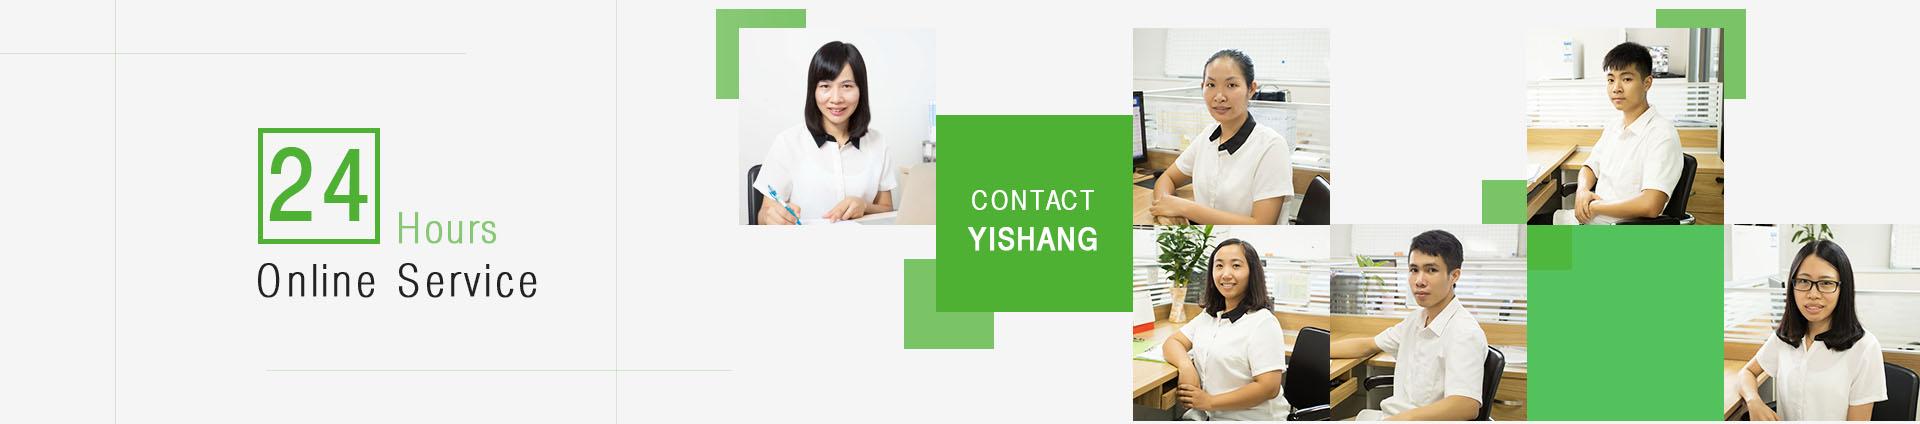 High-quality Display Stand And Professional Display Stand Company-YISHANG